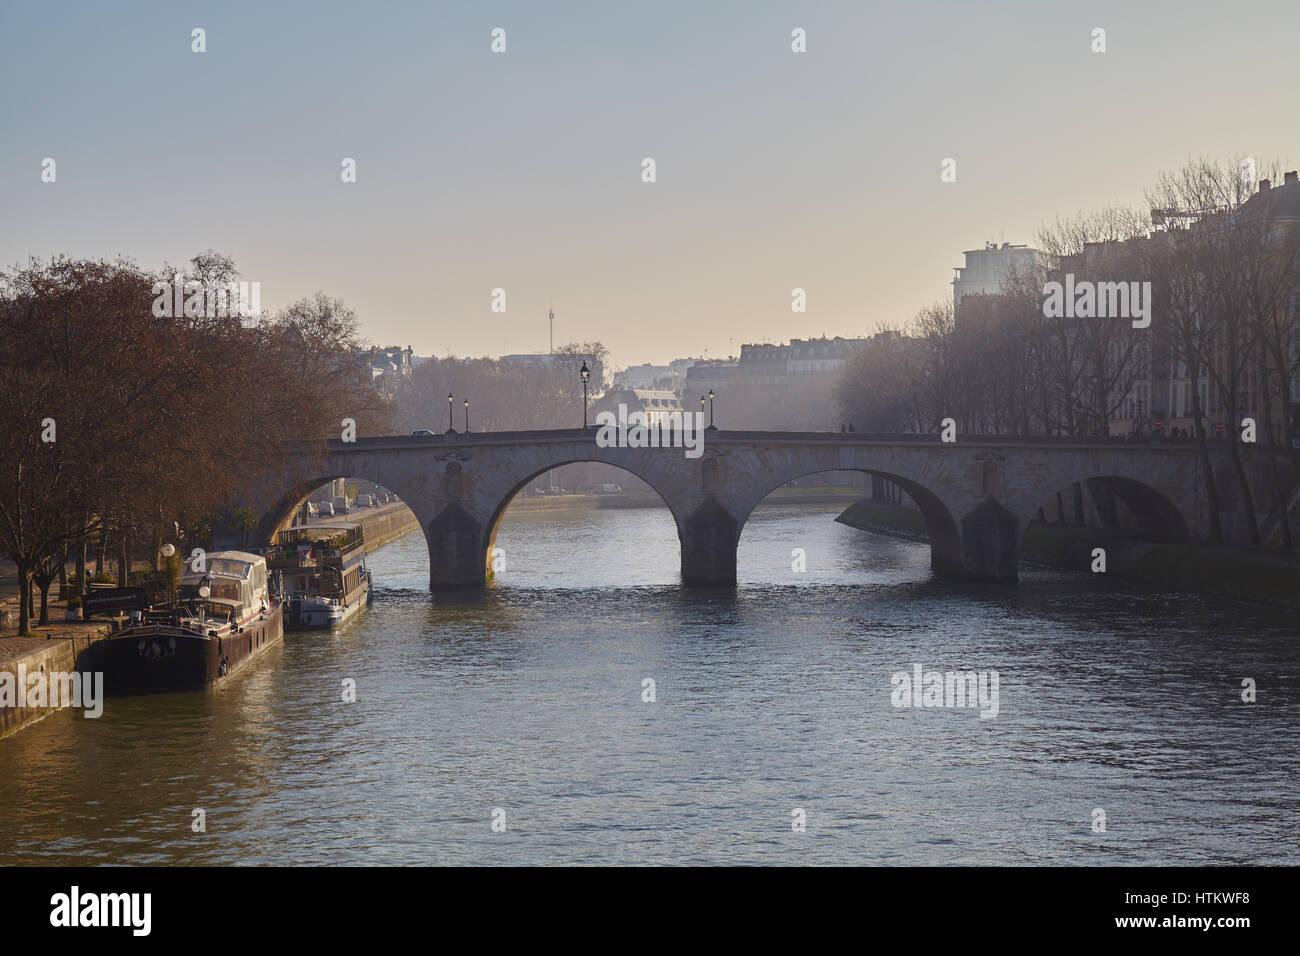 View of one of the bridges across the Seine, the Pont Marie in Paris, Ile-de-France, France - Stock Image